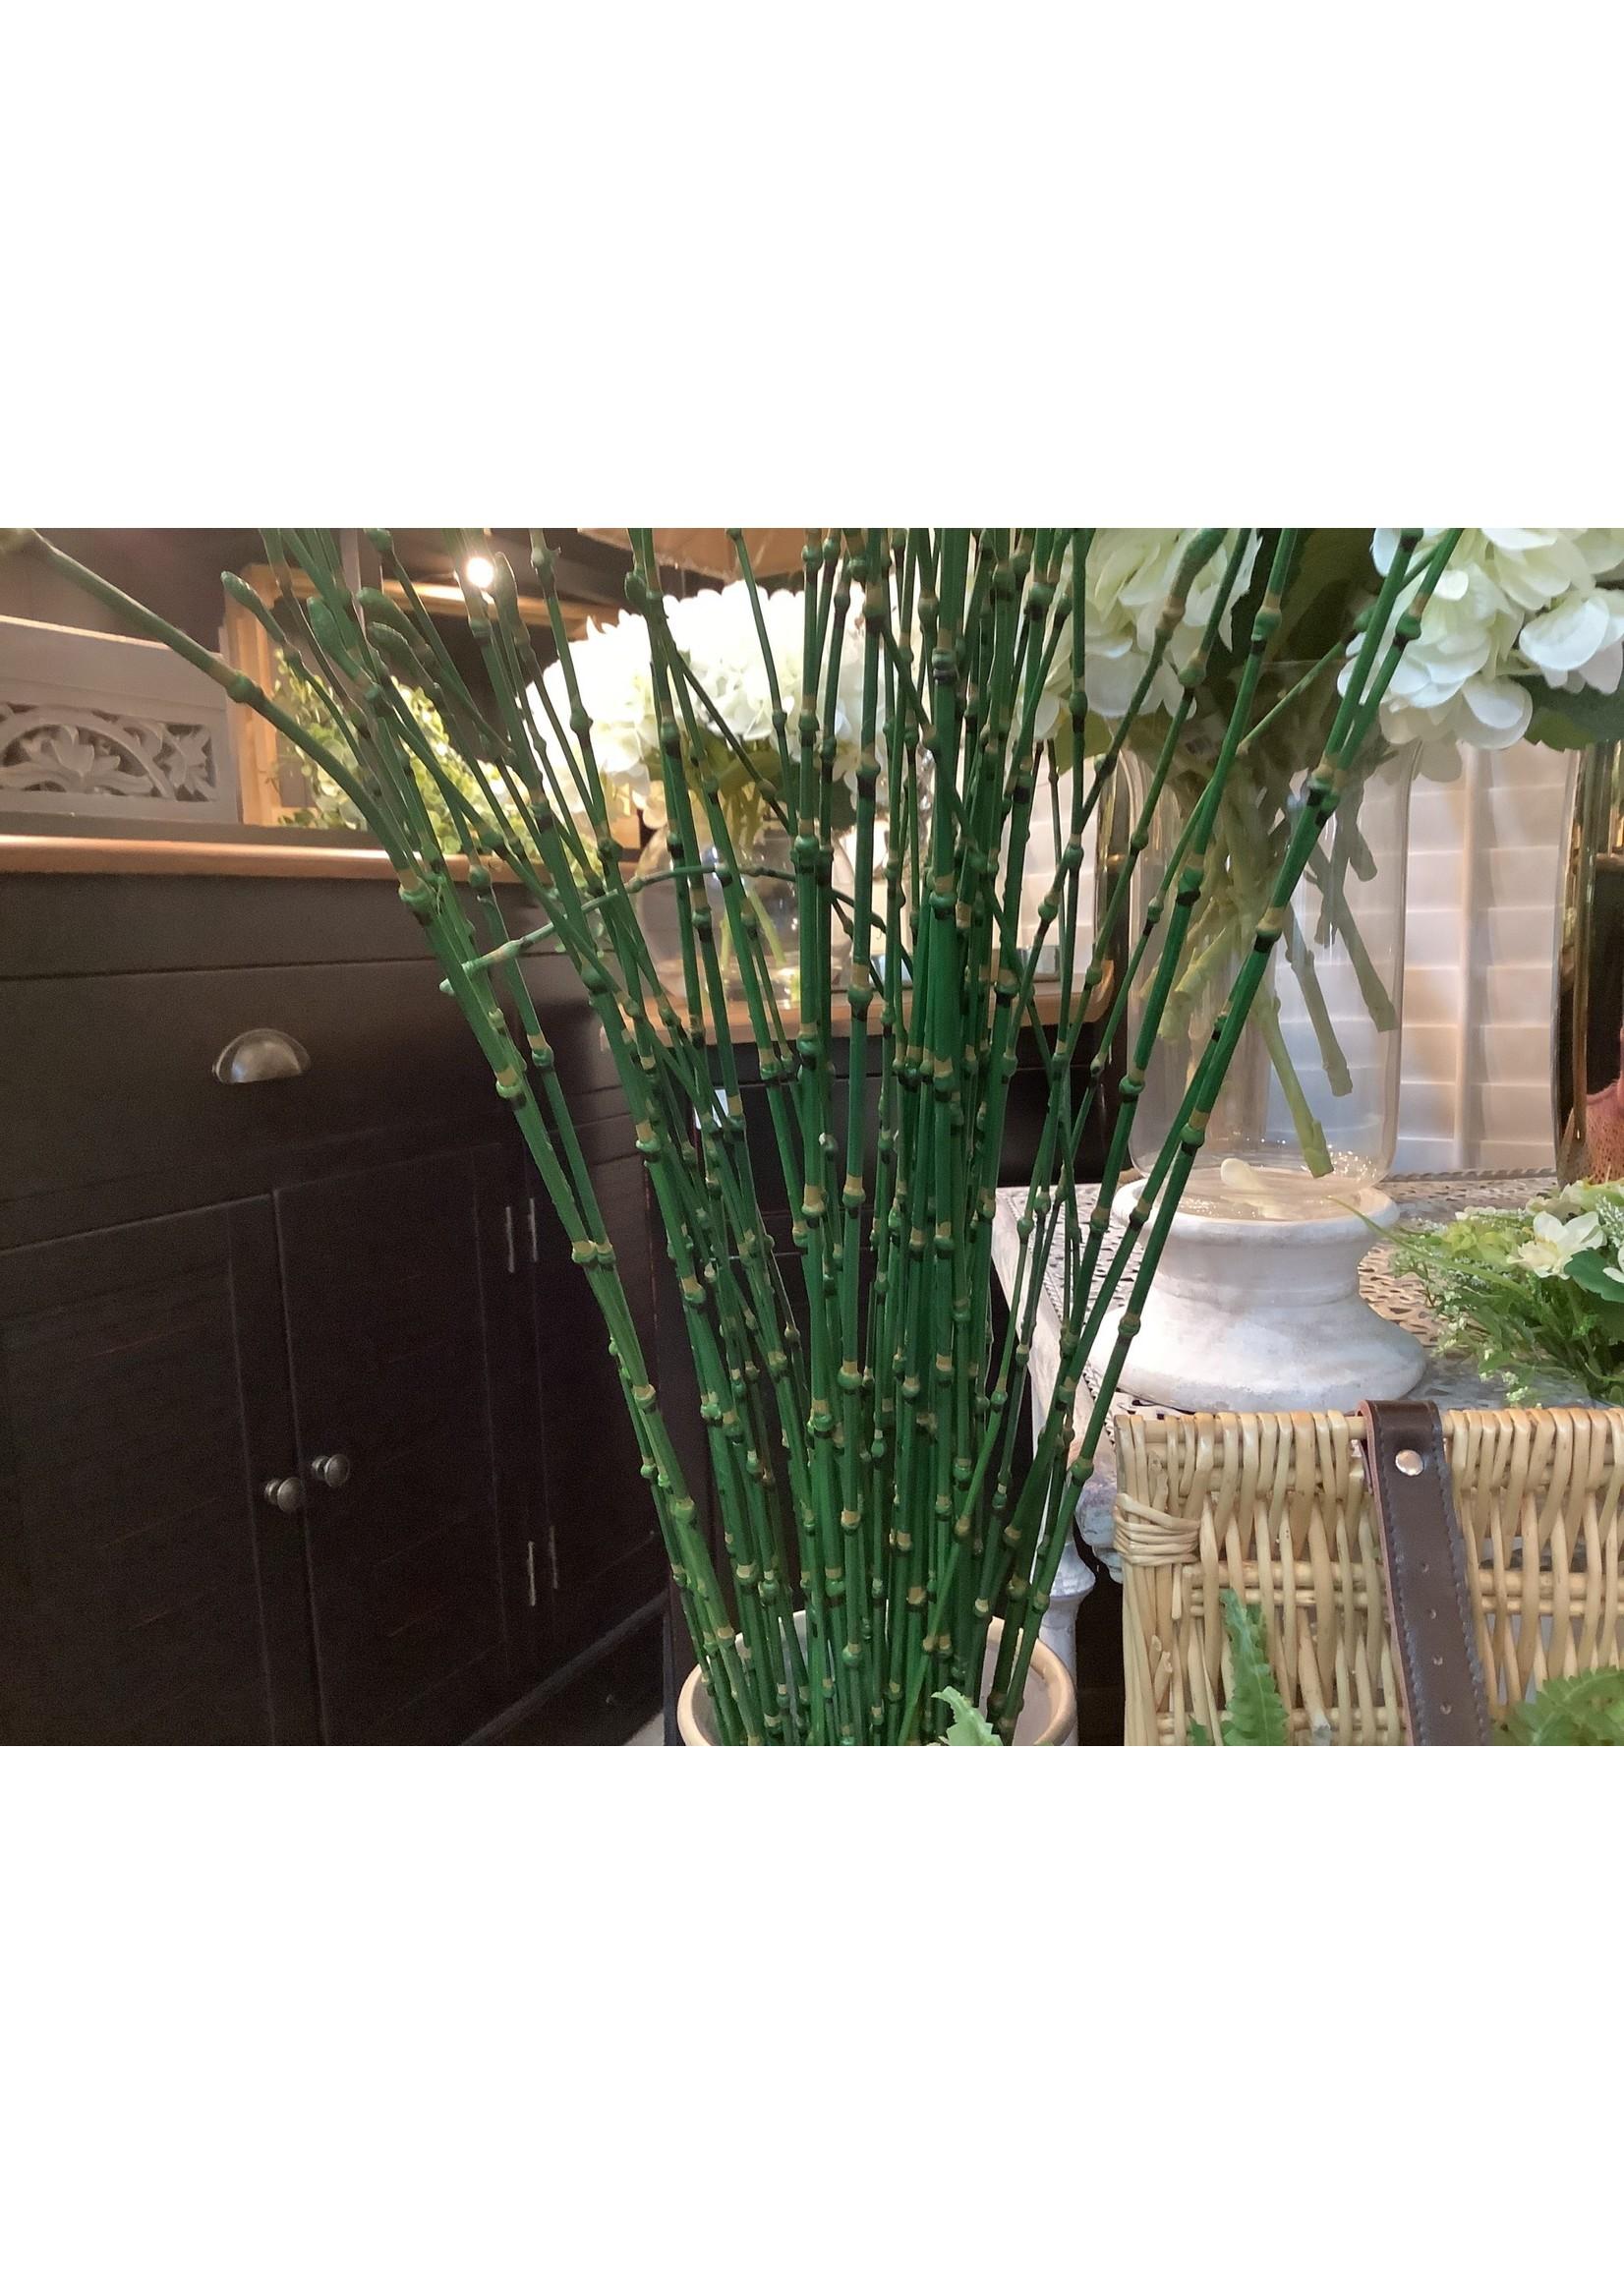 Bamboo Stick Bundle x 5 90cm